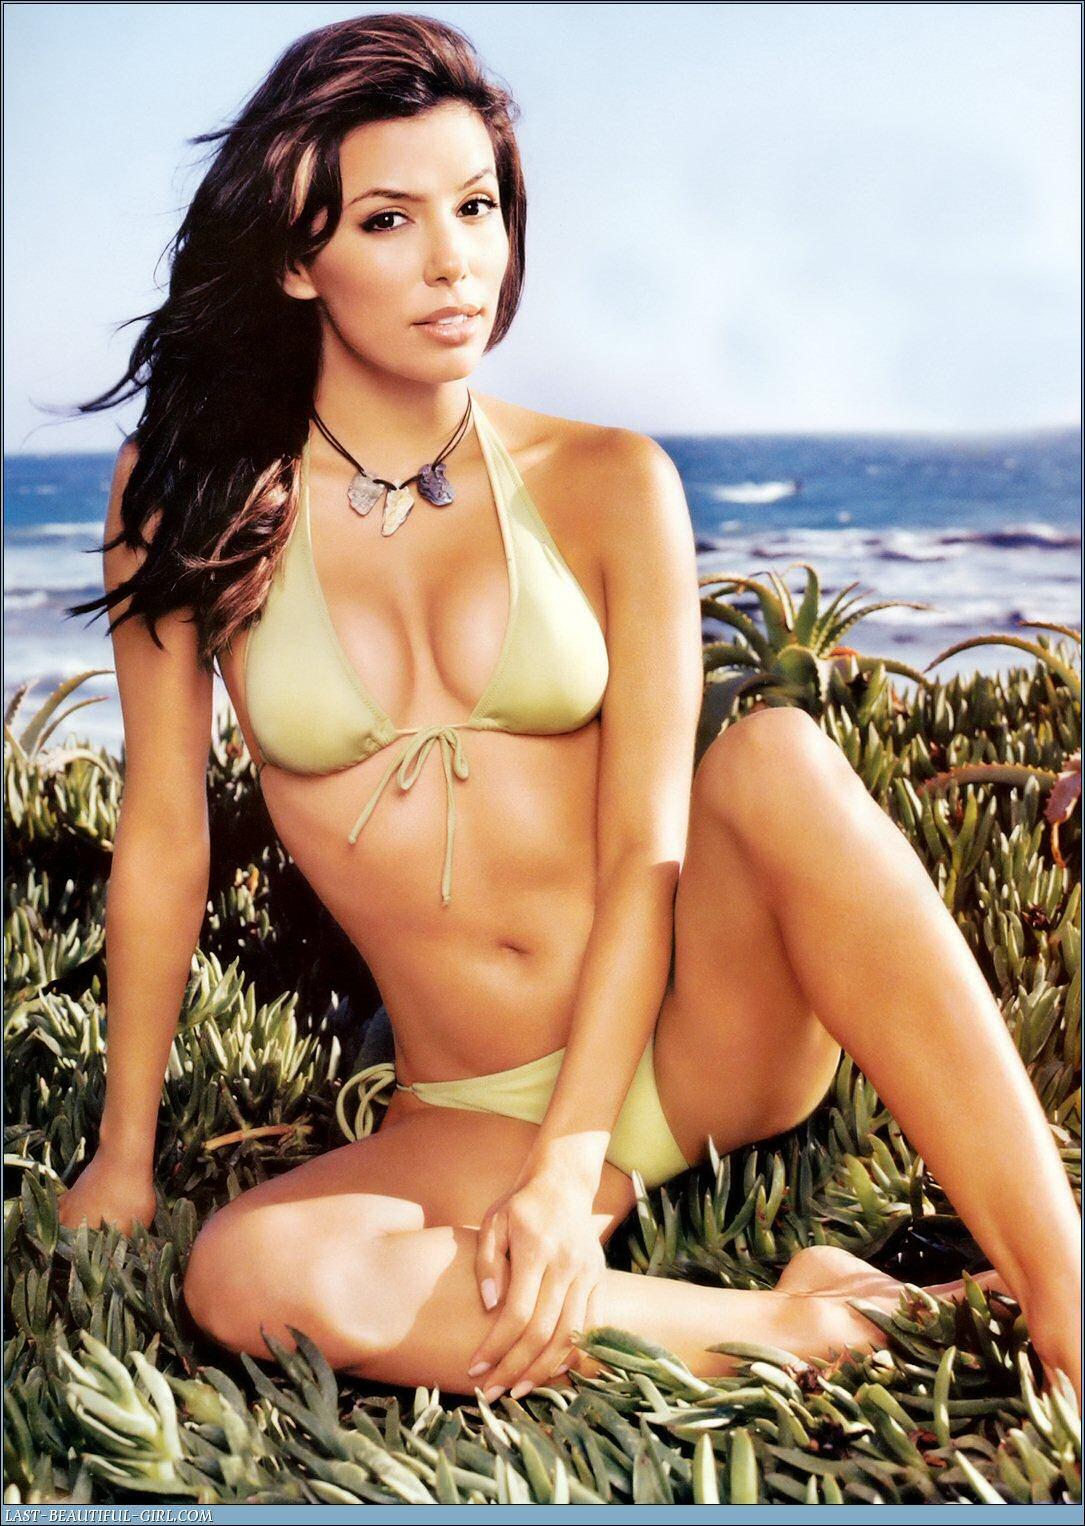 Celebrity Arena: Eva Longoria Hot Sexy Photo & Biography